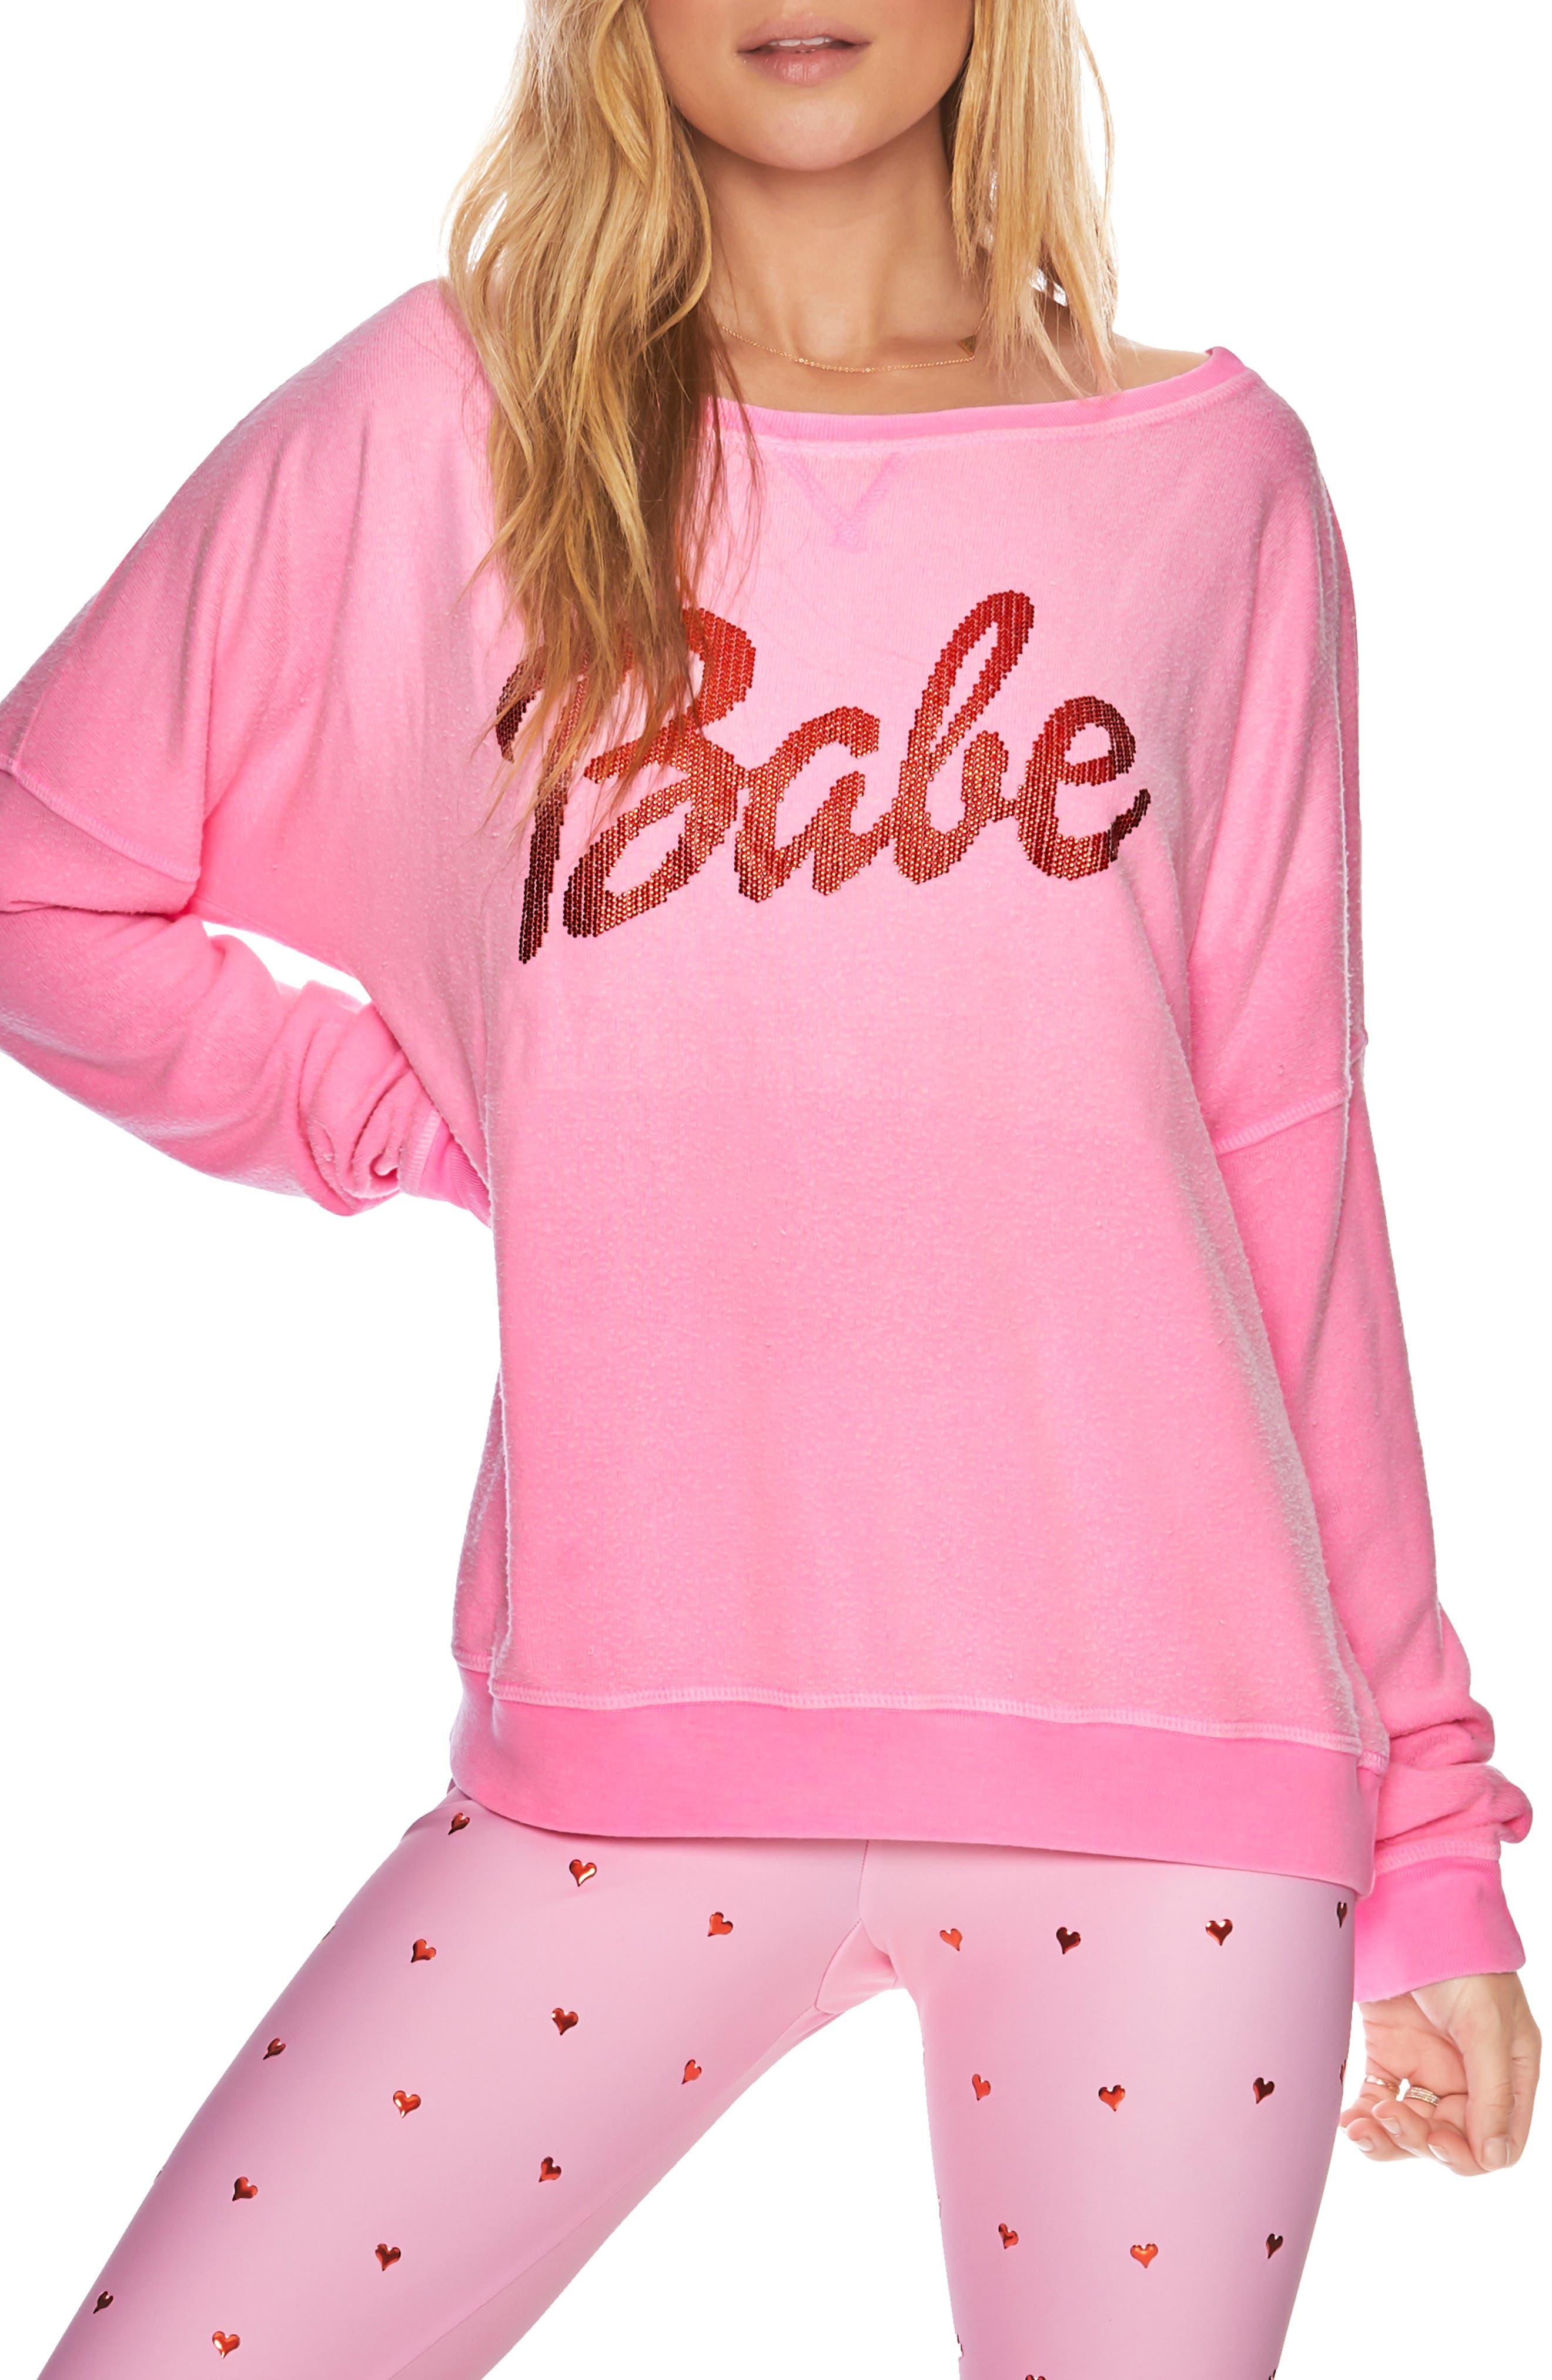 BEACH RIOT, Babe Sweatshirt, Main thumbnail 1, color, PINK